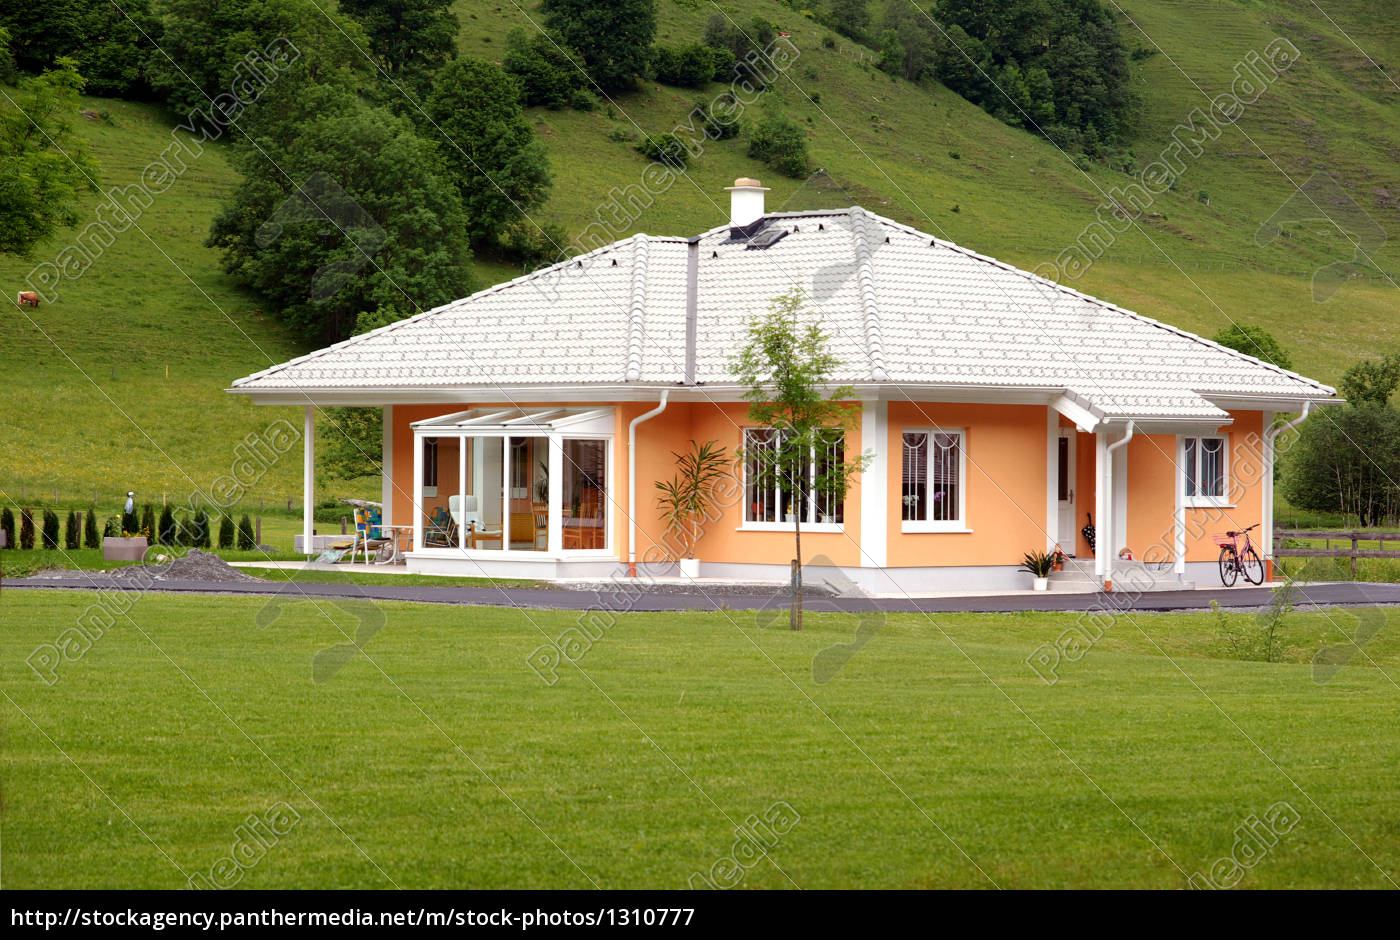 bungalow - 1310777